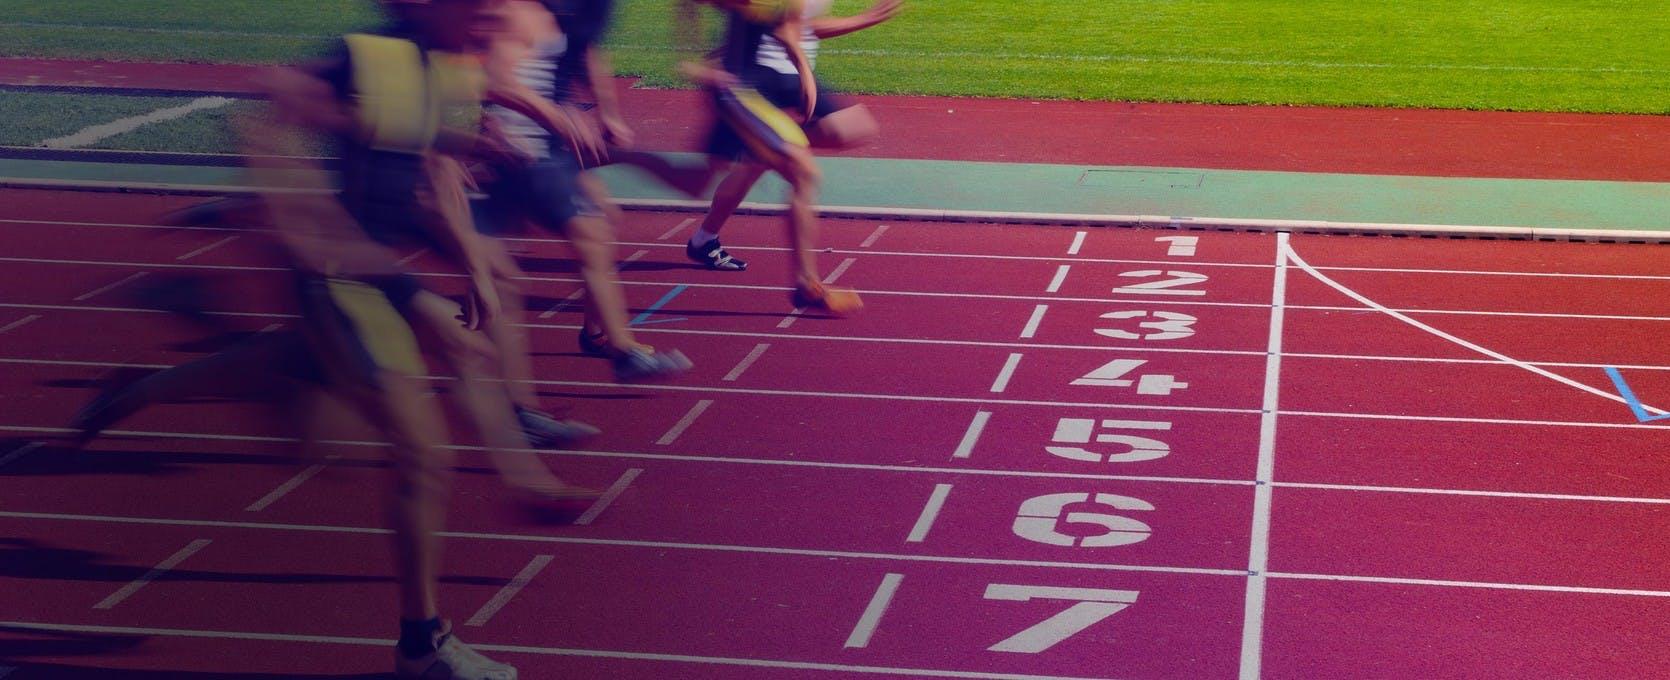 Runners nearing the finish line